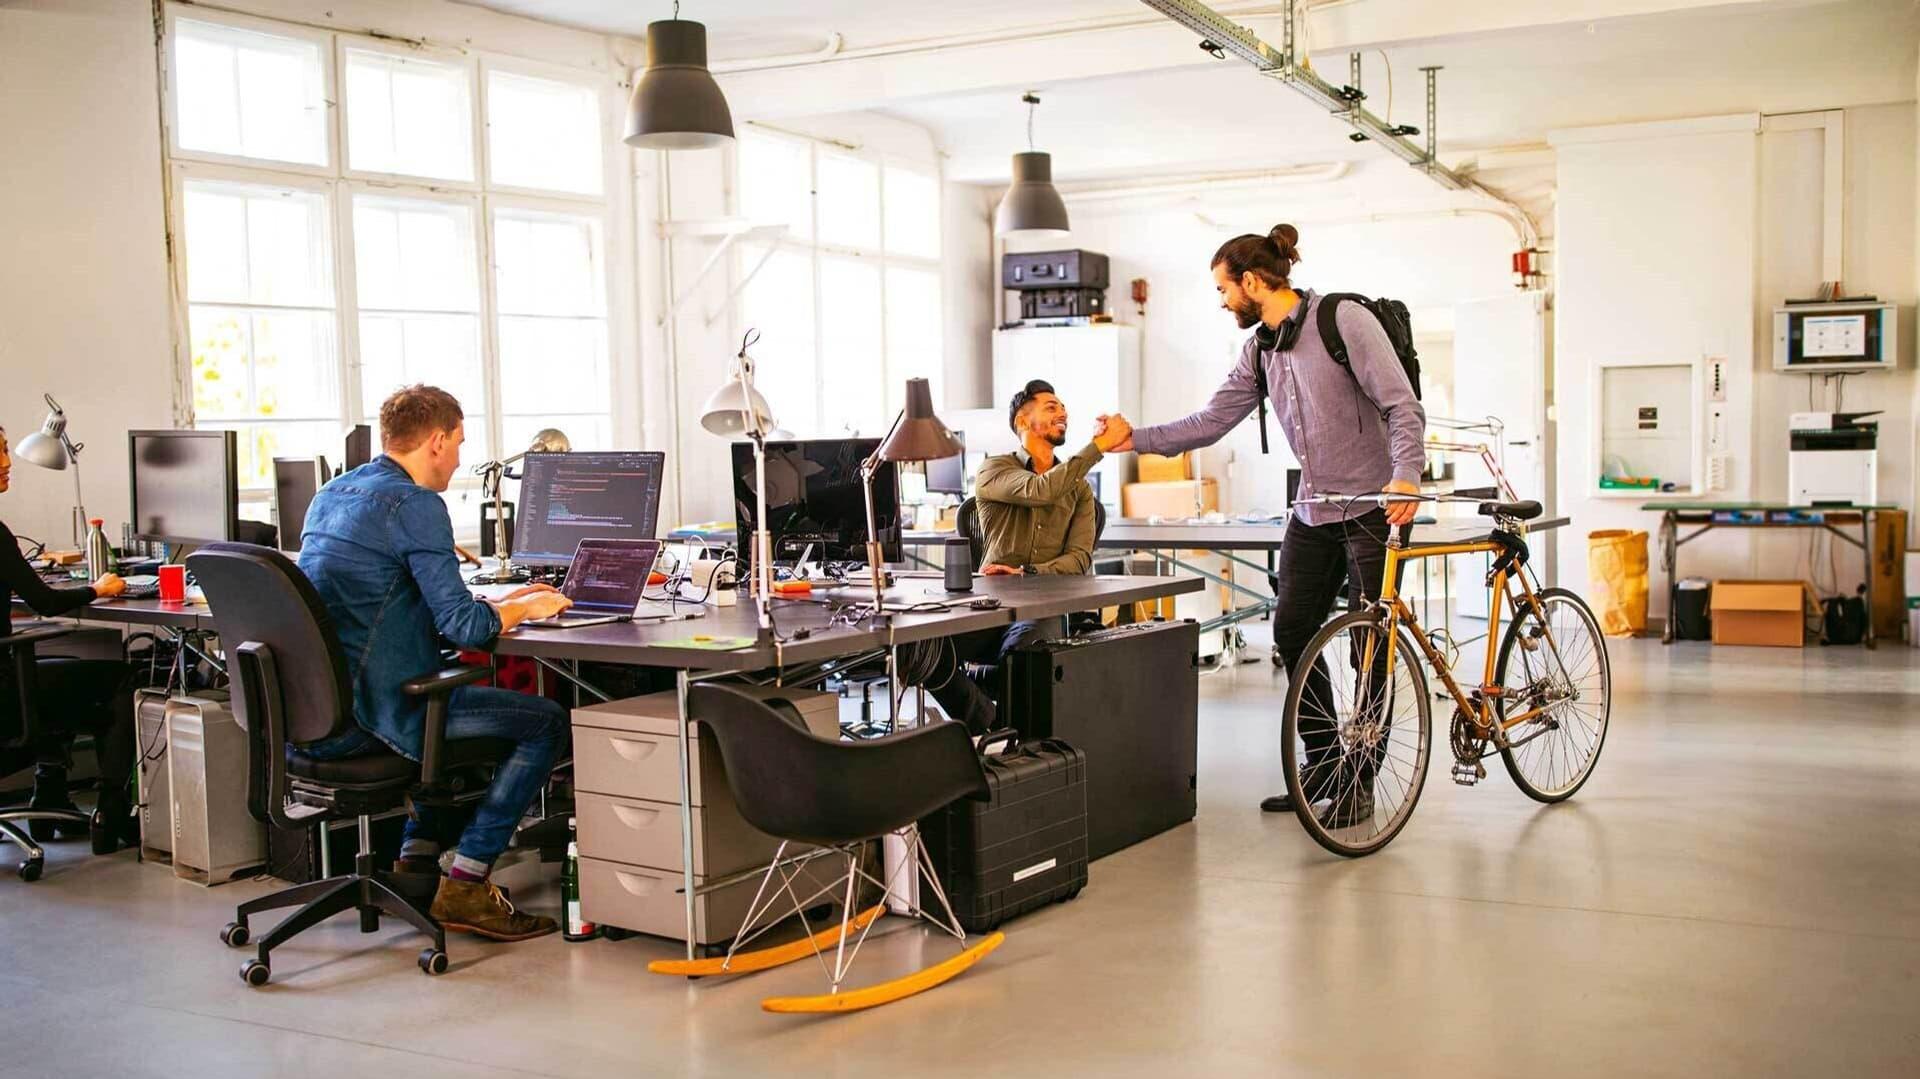 Begrüßung im Büro mit Fahrrad